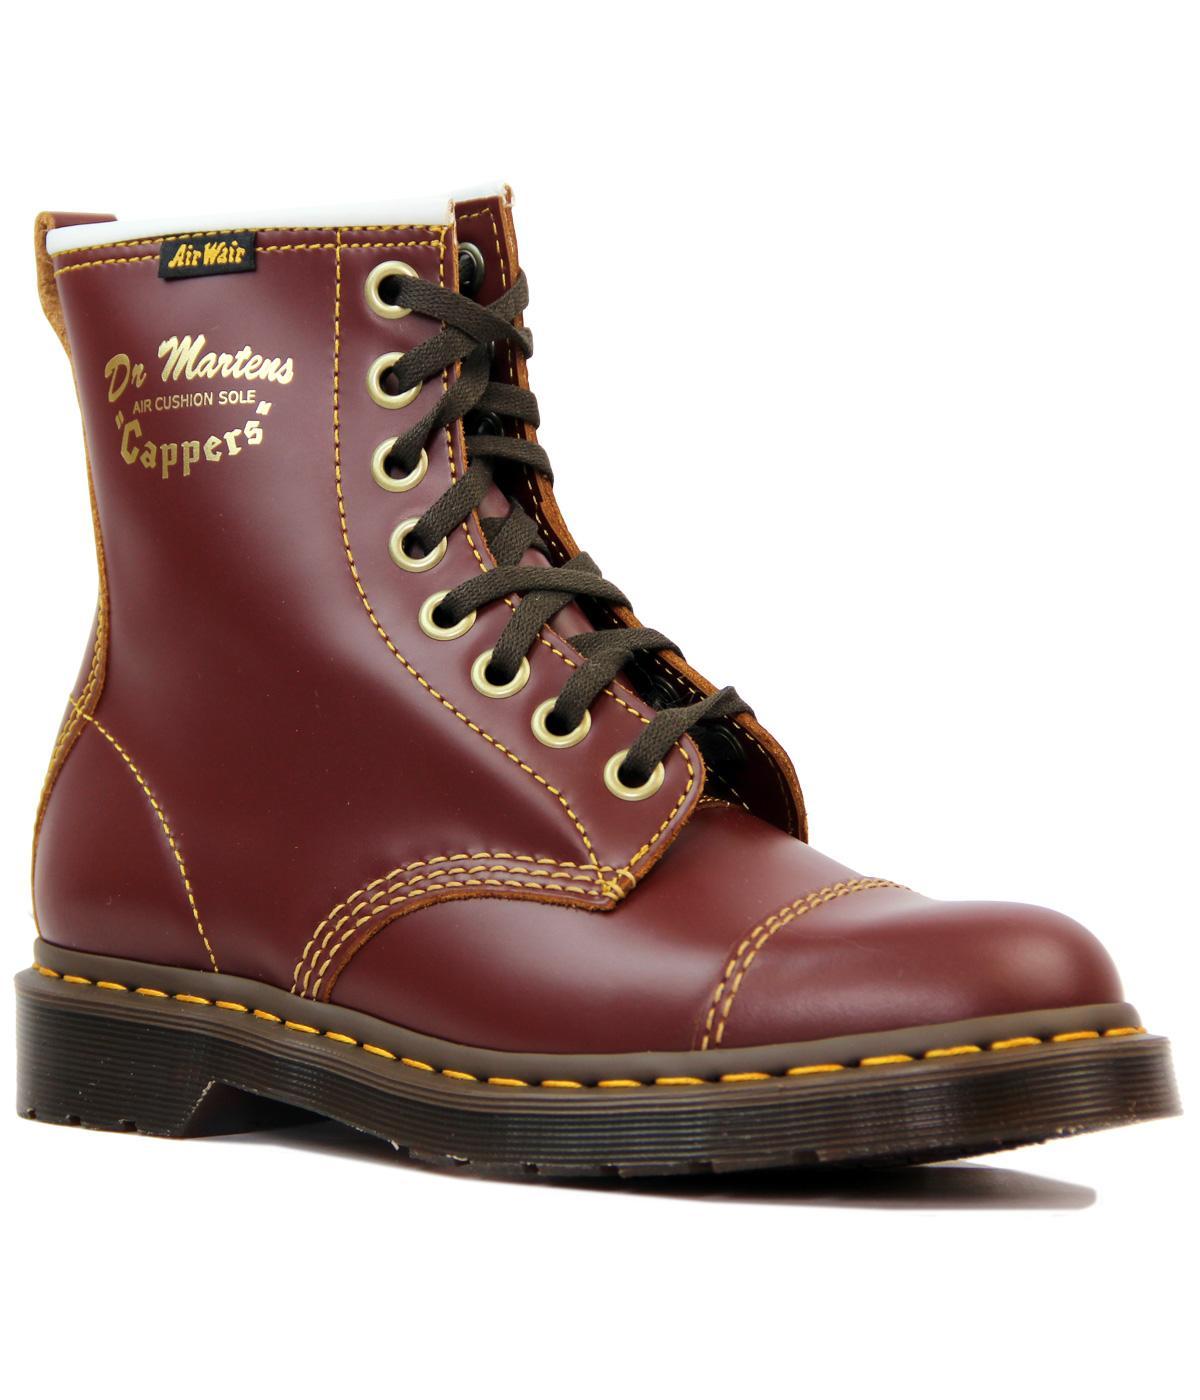 DR MARTENS Archive Philips Capper Mod Boots